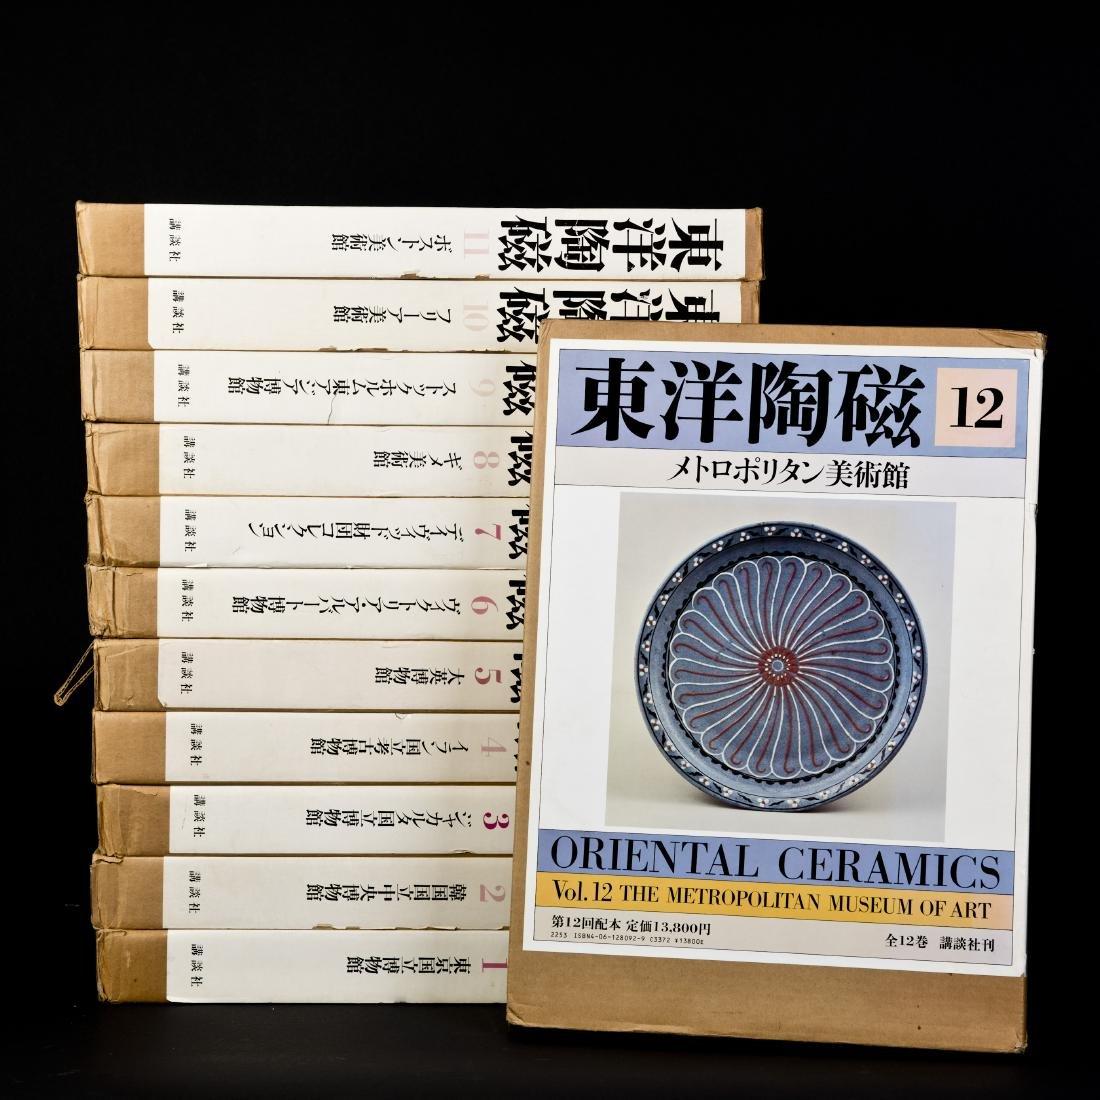 12-VOLUME SET OF BOOKS ON ORIENTAL CERAMIC WORKS